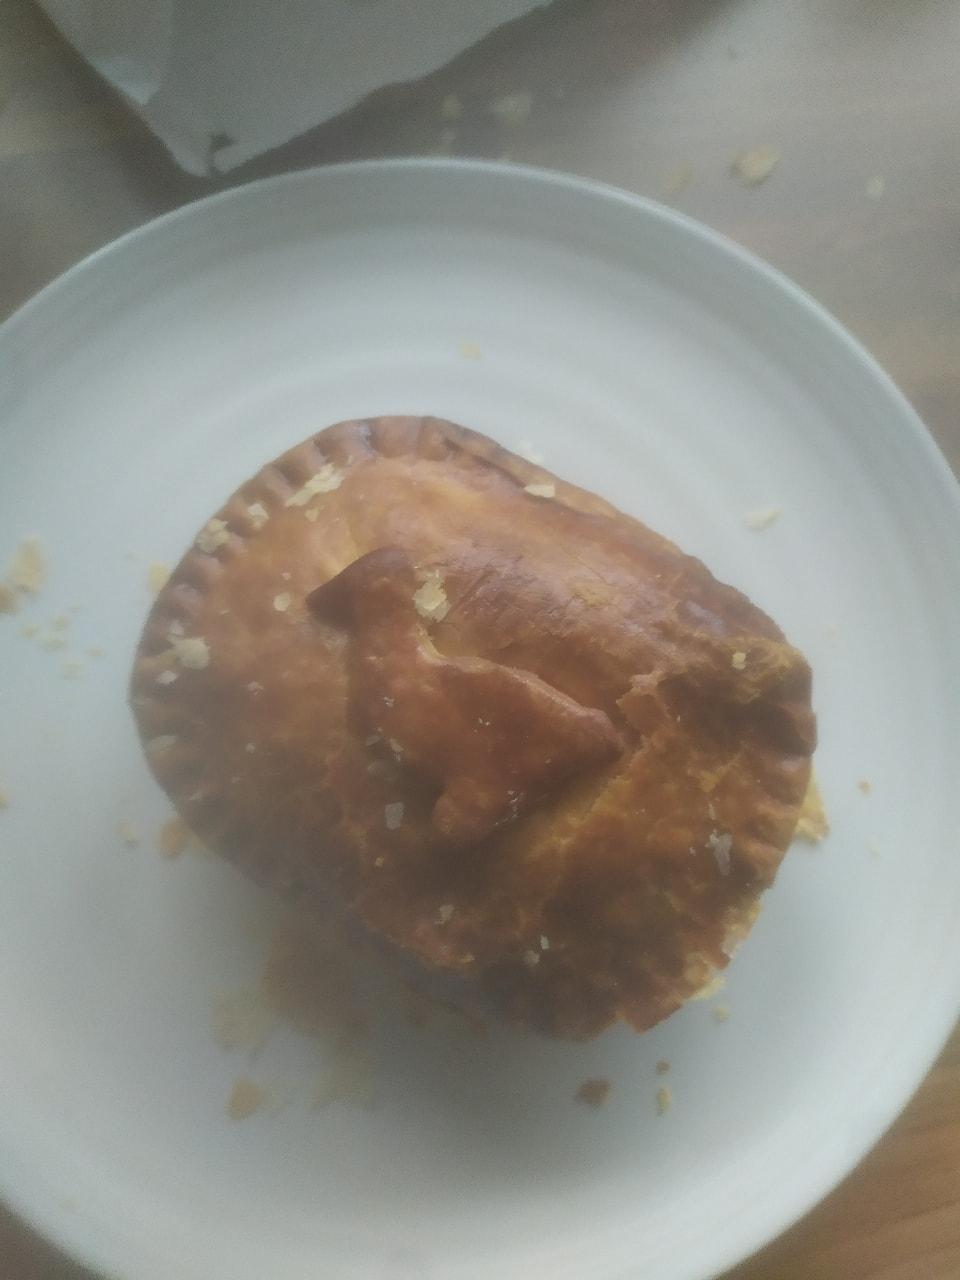 Pie - contents unknown